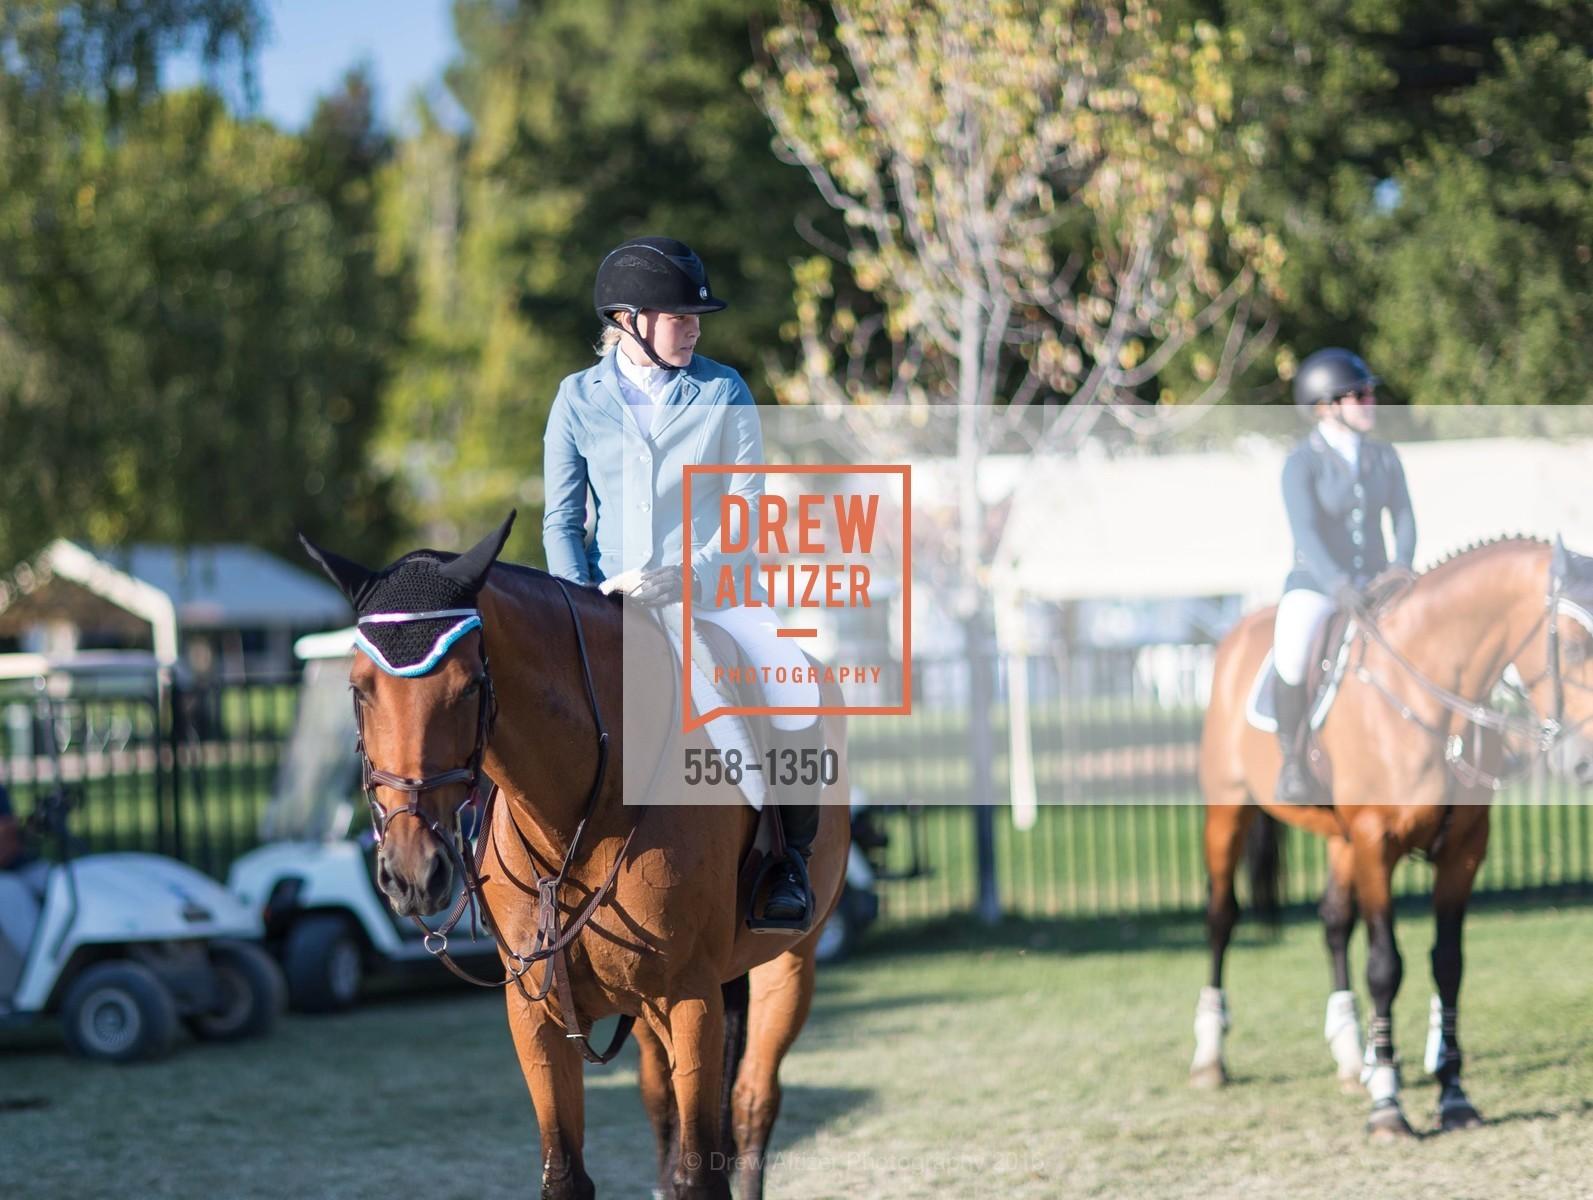 Horse Show, Photo #558-1350